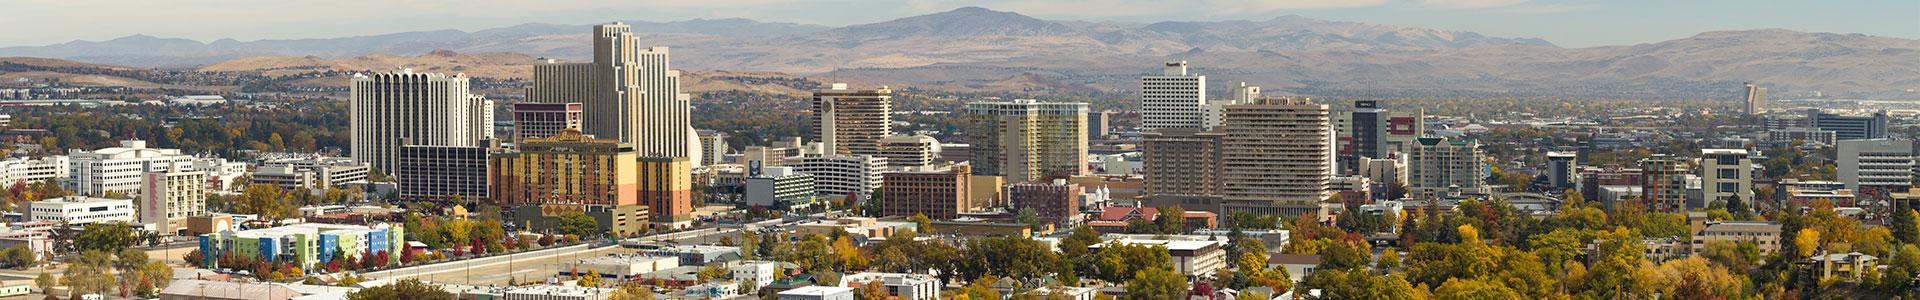 Reno Events Calendar 2021 Reno Events and Lake Tahoe Events | Visit Reno Tahoe